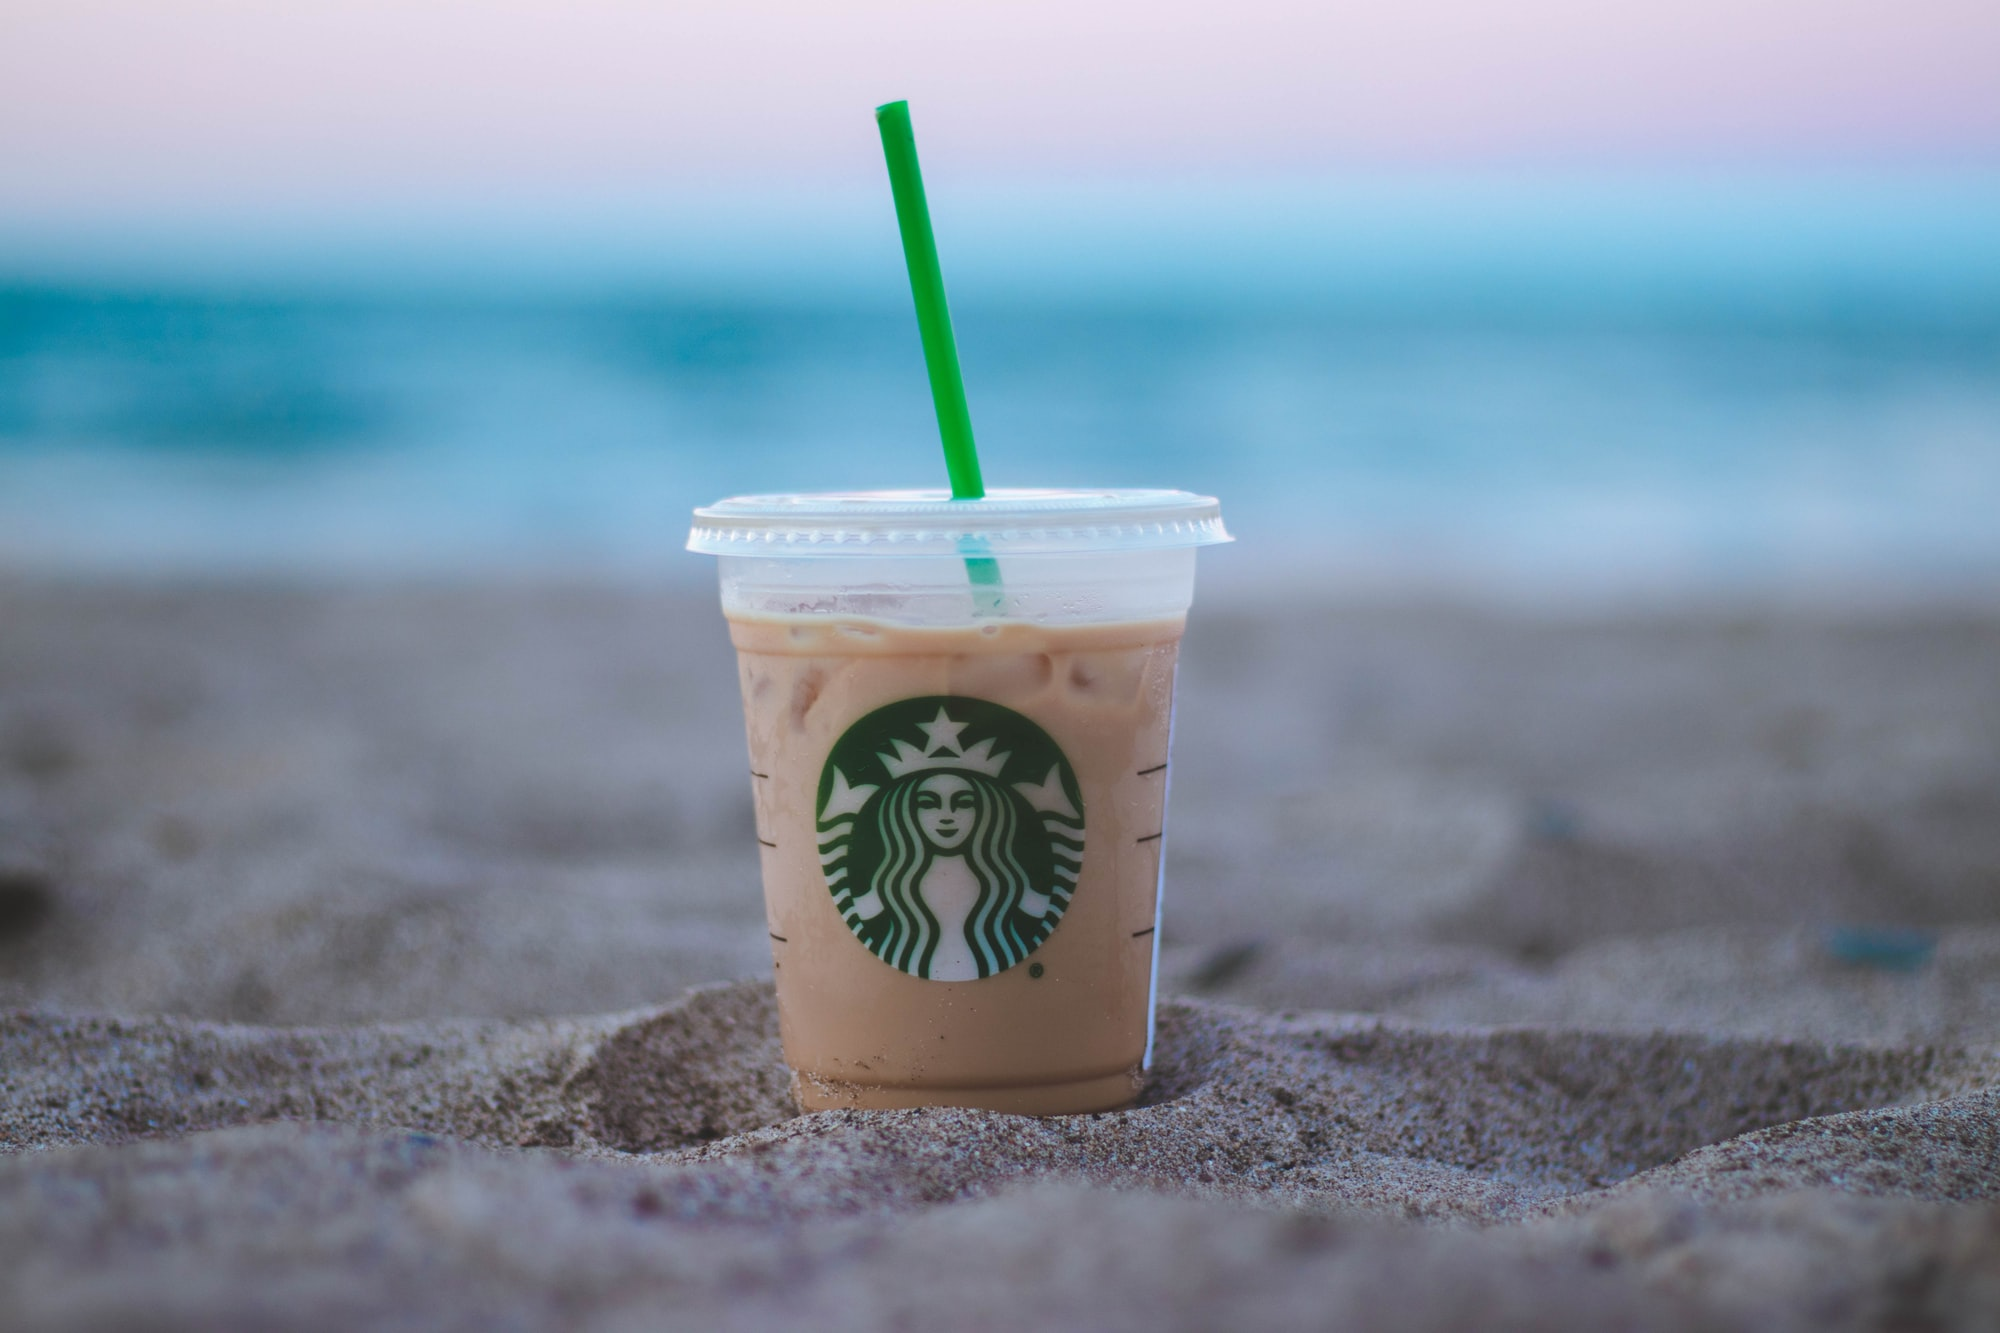 Starbucks นำเมล็ดพันธุ์กาแฟเข้าสู่เทคโนโลยี Blockchain